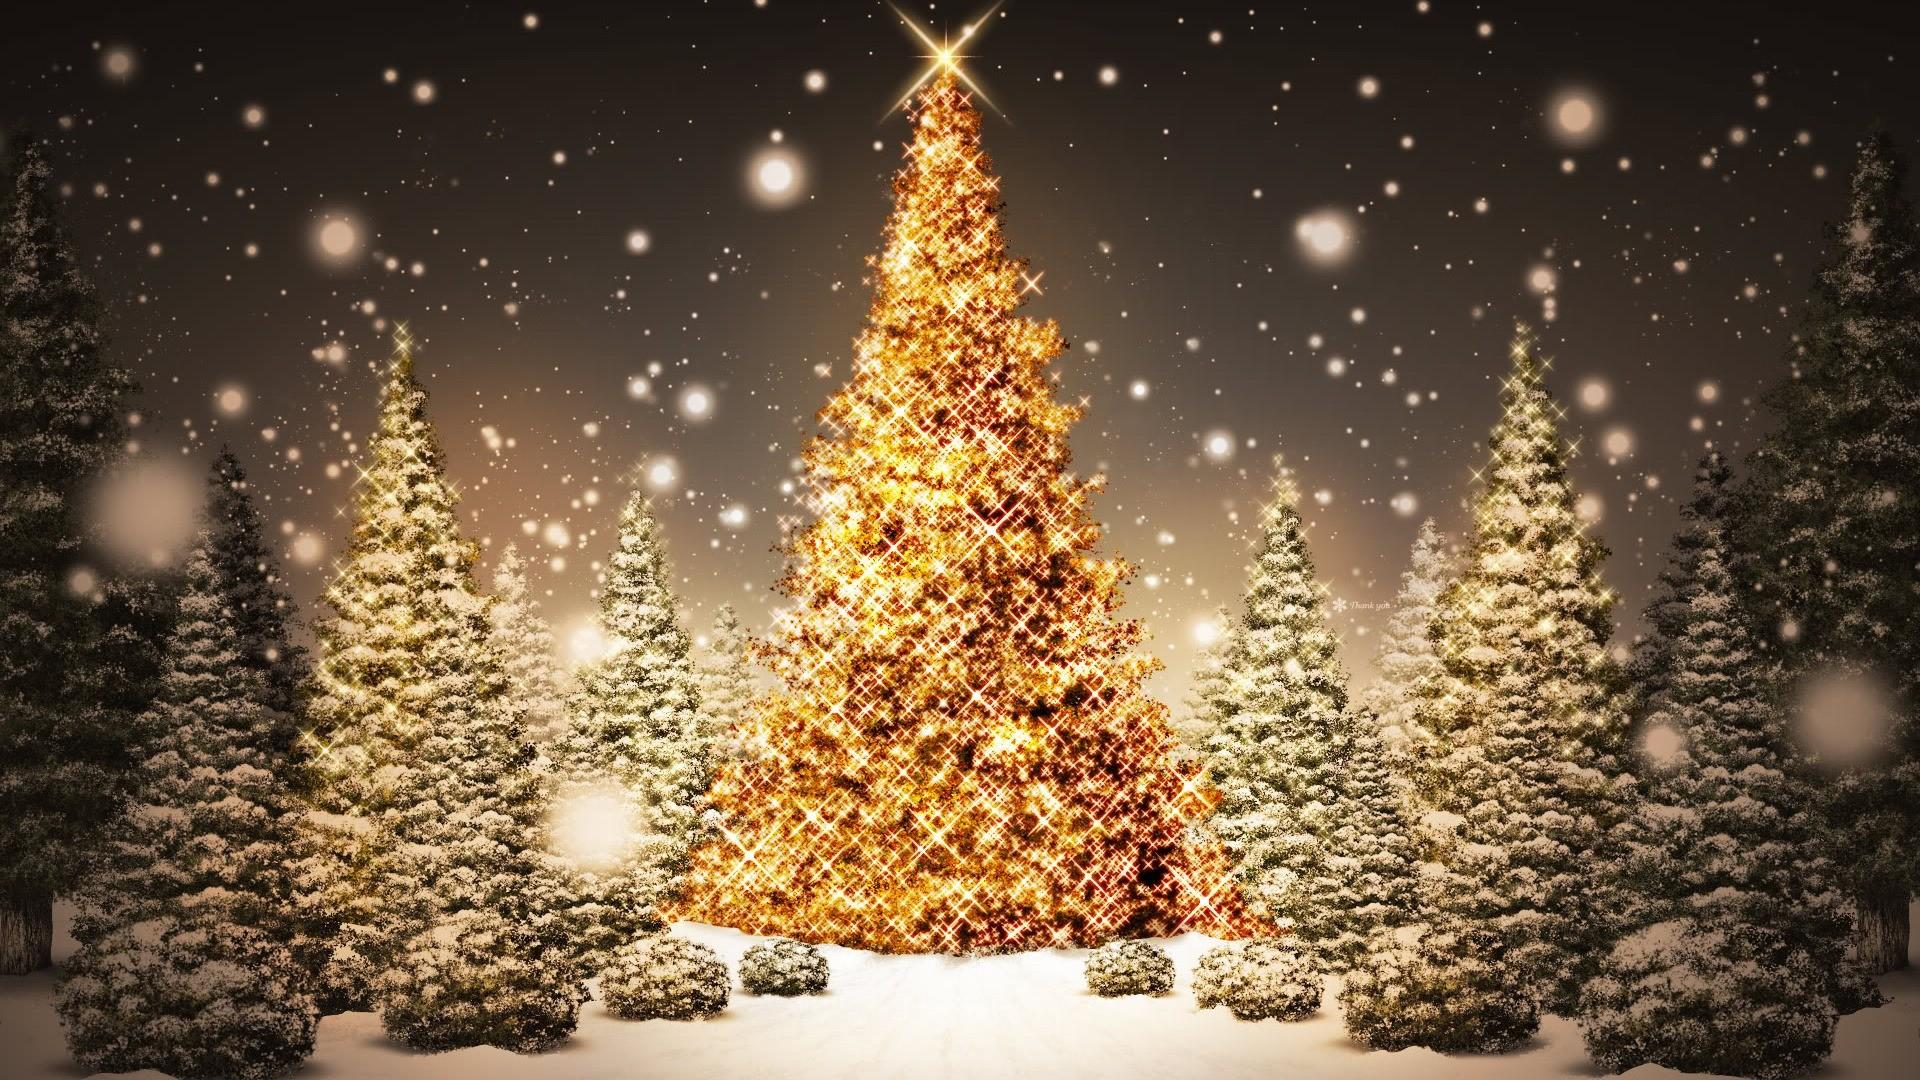 Free Christmas Lights Wallpaper. 1920×1080